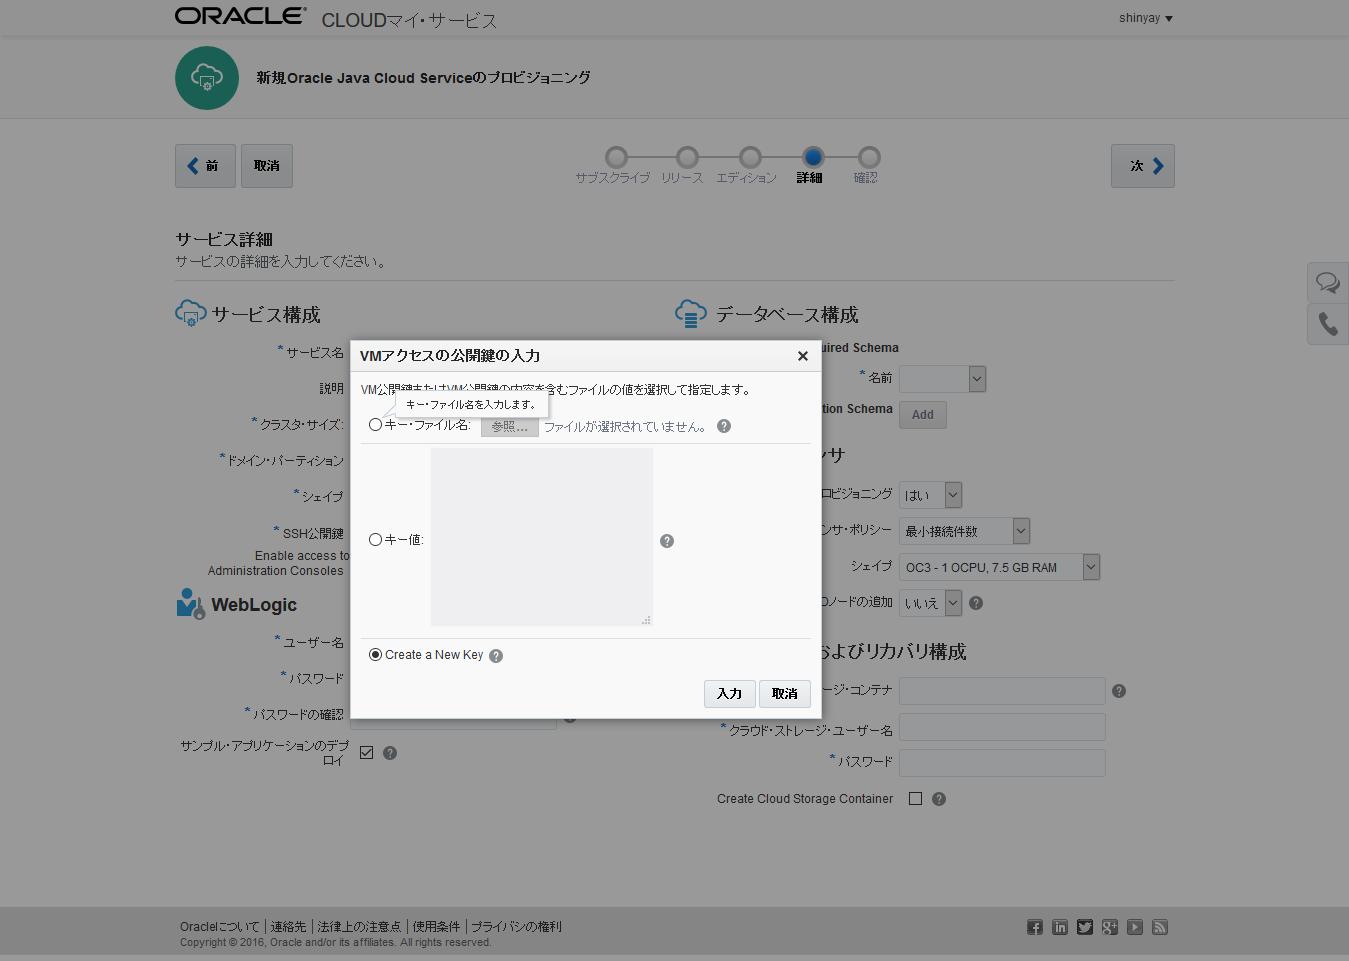 SSK-public-key